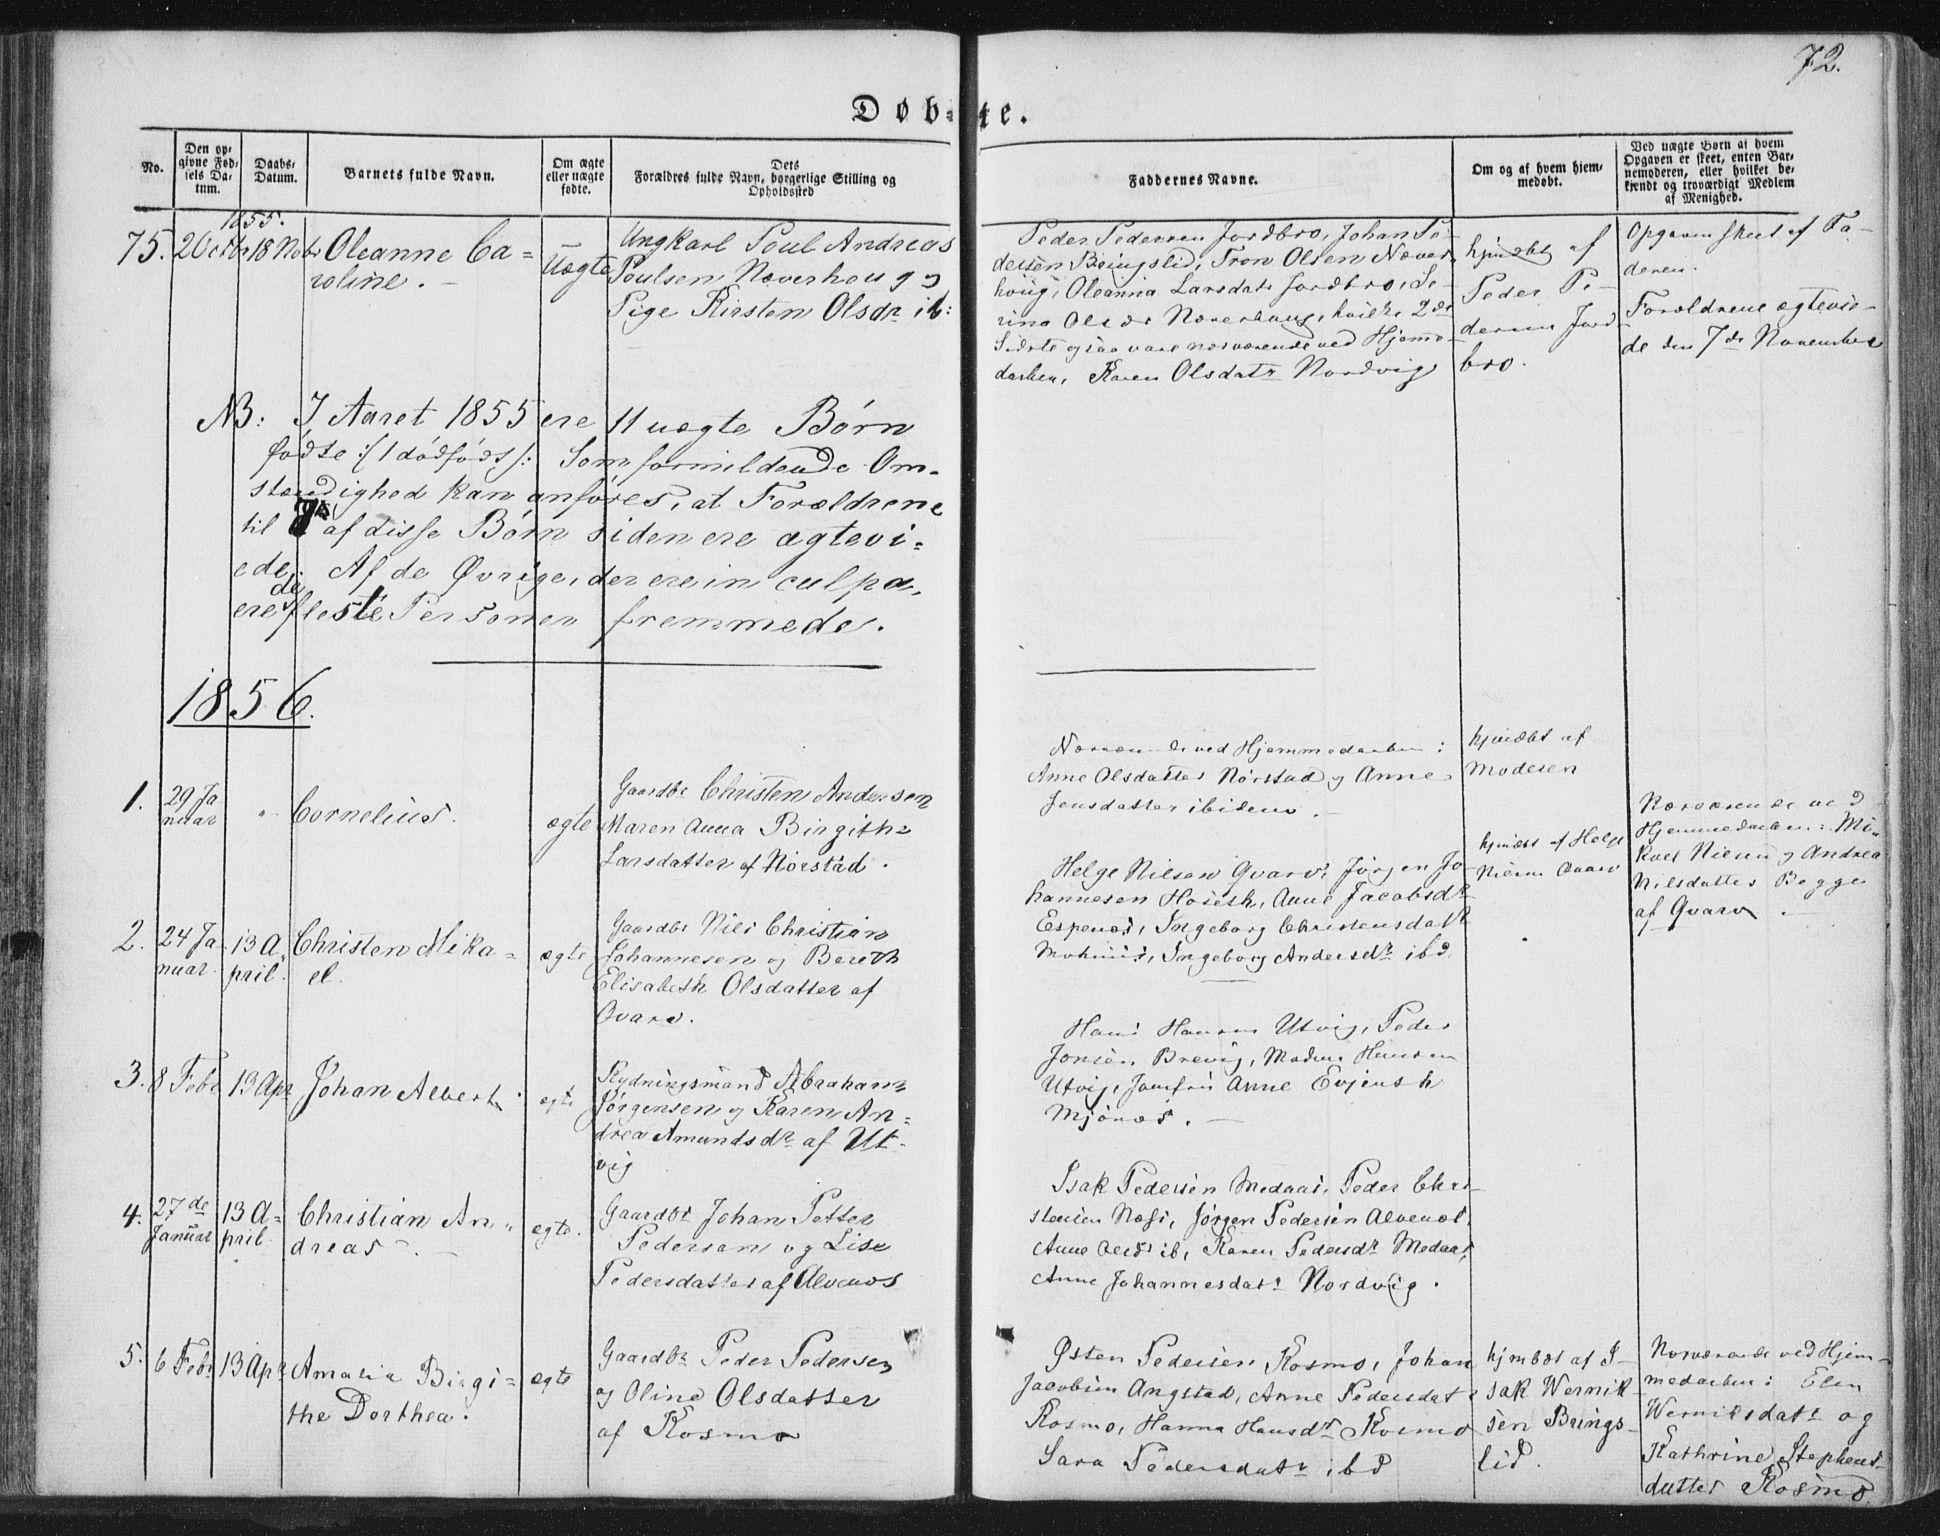 SAT, Ministerialprotokoller, klokkerbøker og fødselsregistre - Nordland, 852/L0738: Ministerialbok nr. 852A08, 1849-1865, s. 72